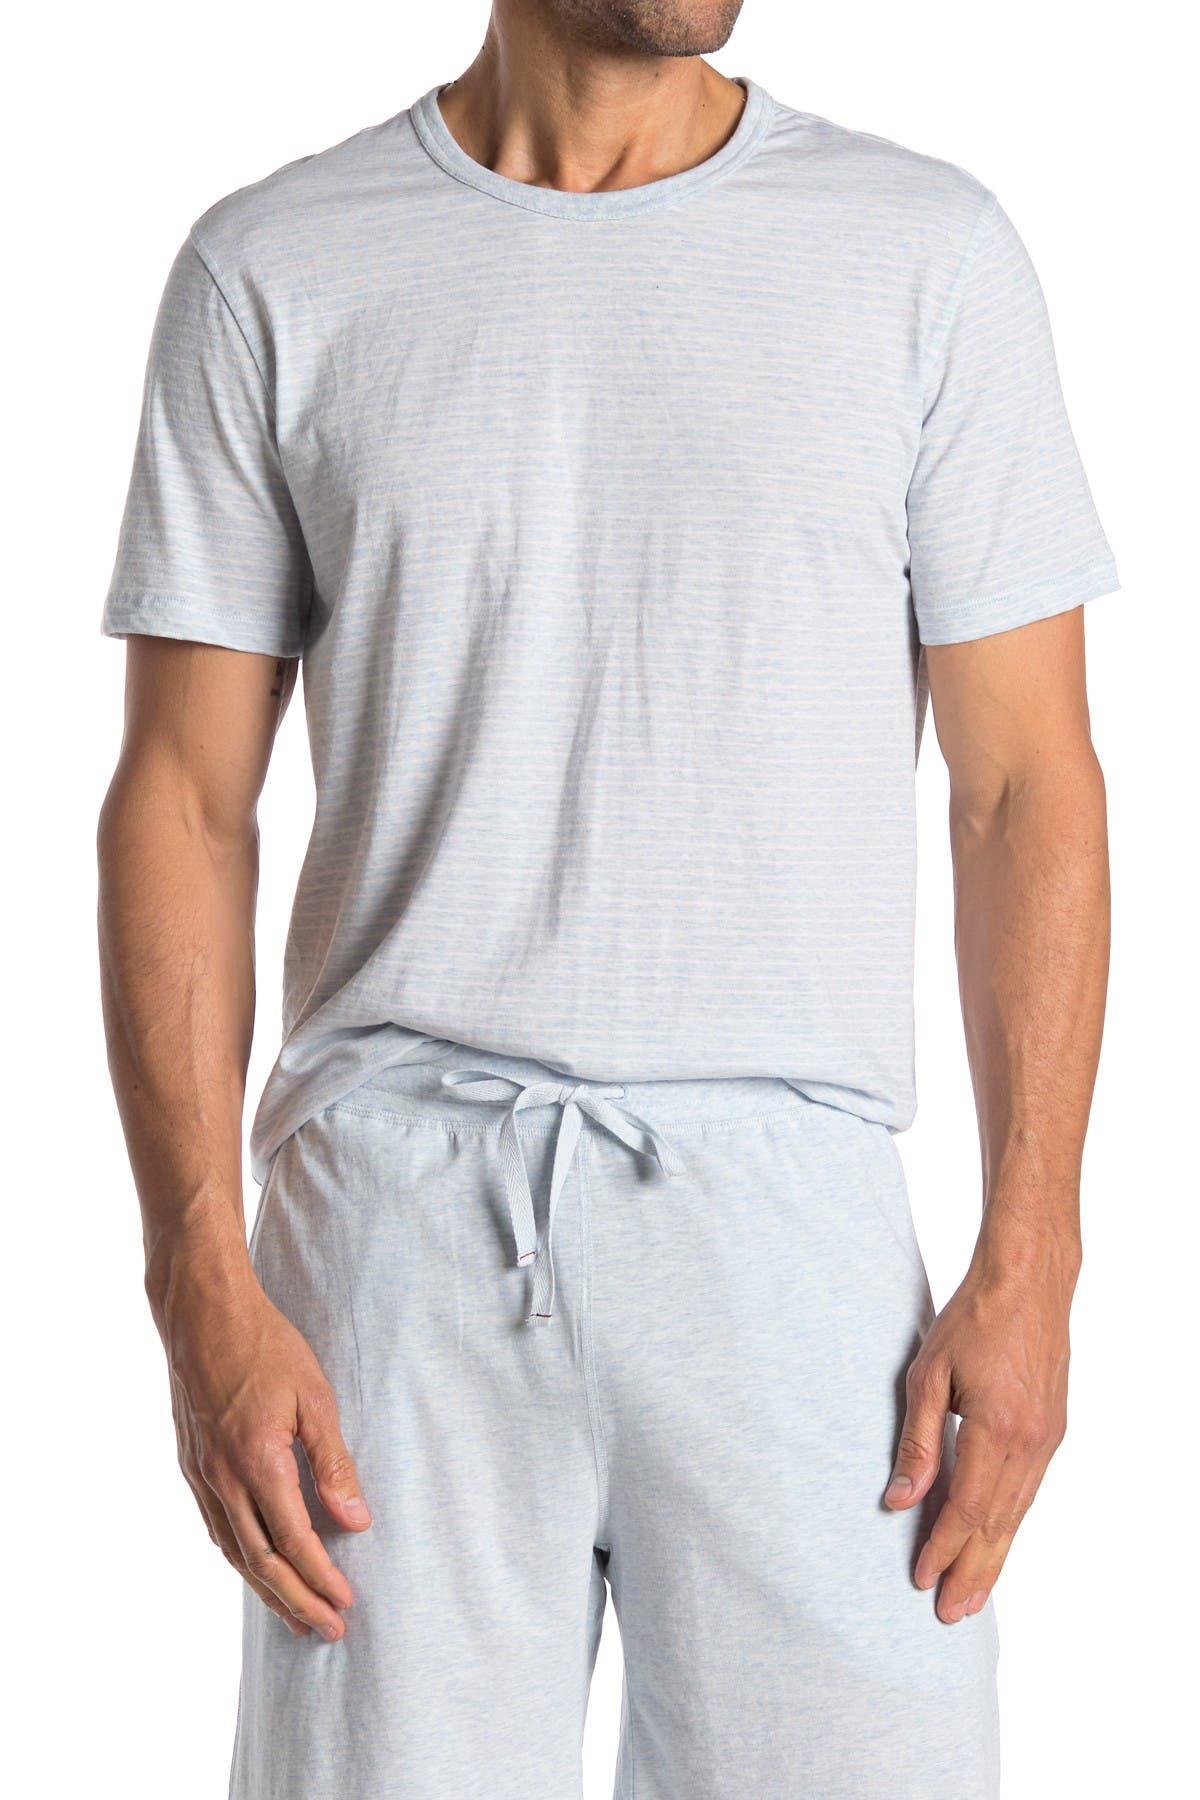 Image of Daniel Buchler Crew Neck Knit T-Shirt